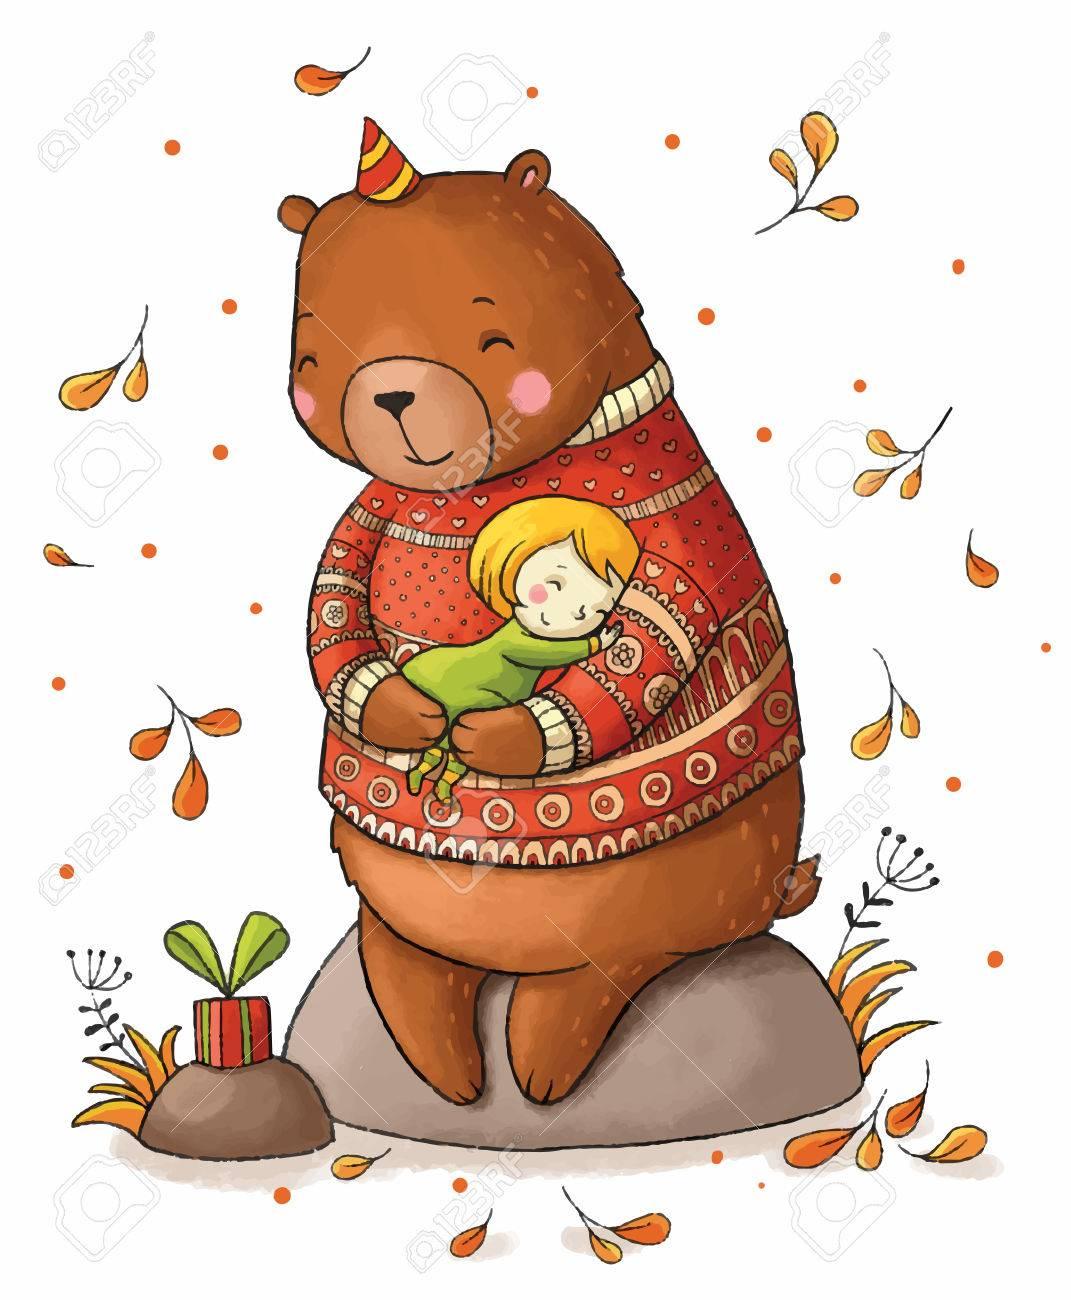 Brown teddy bear hugging a girl. - 51949282